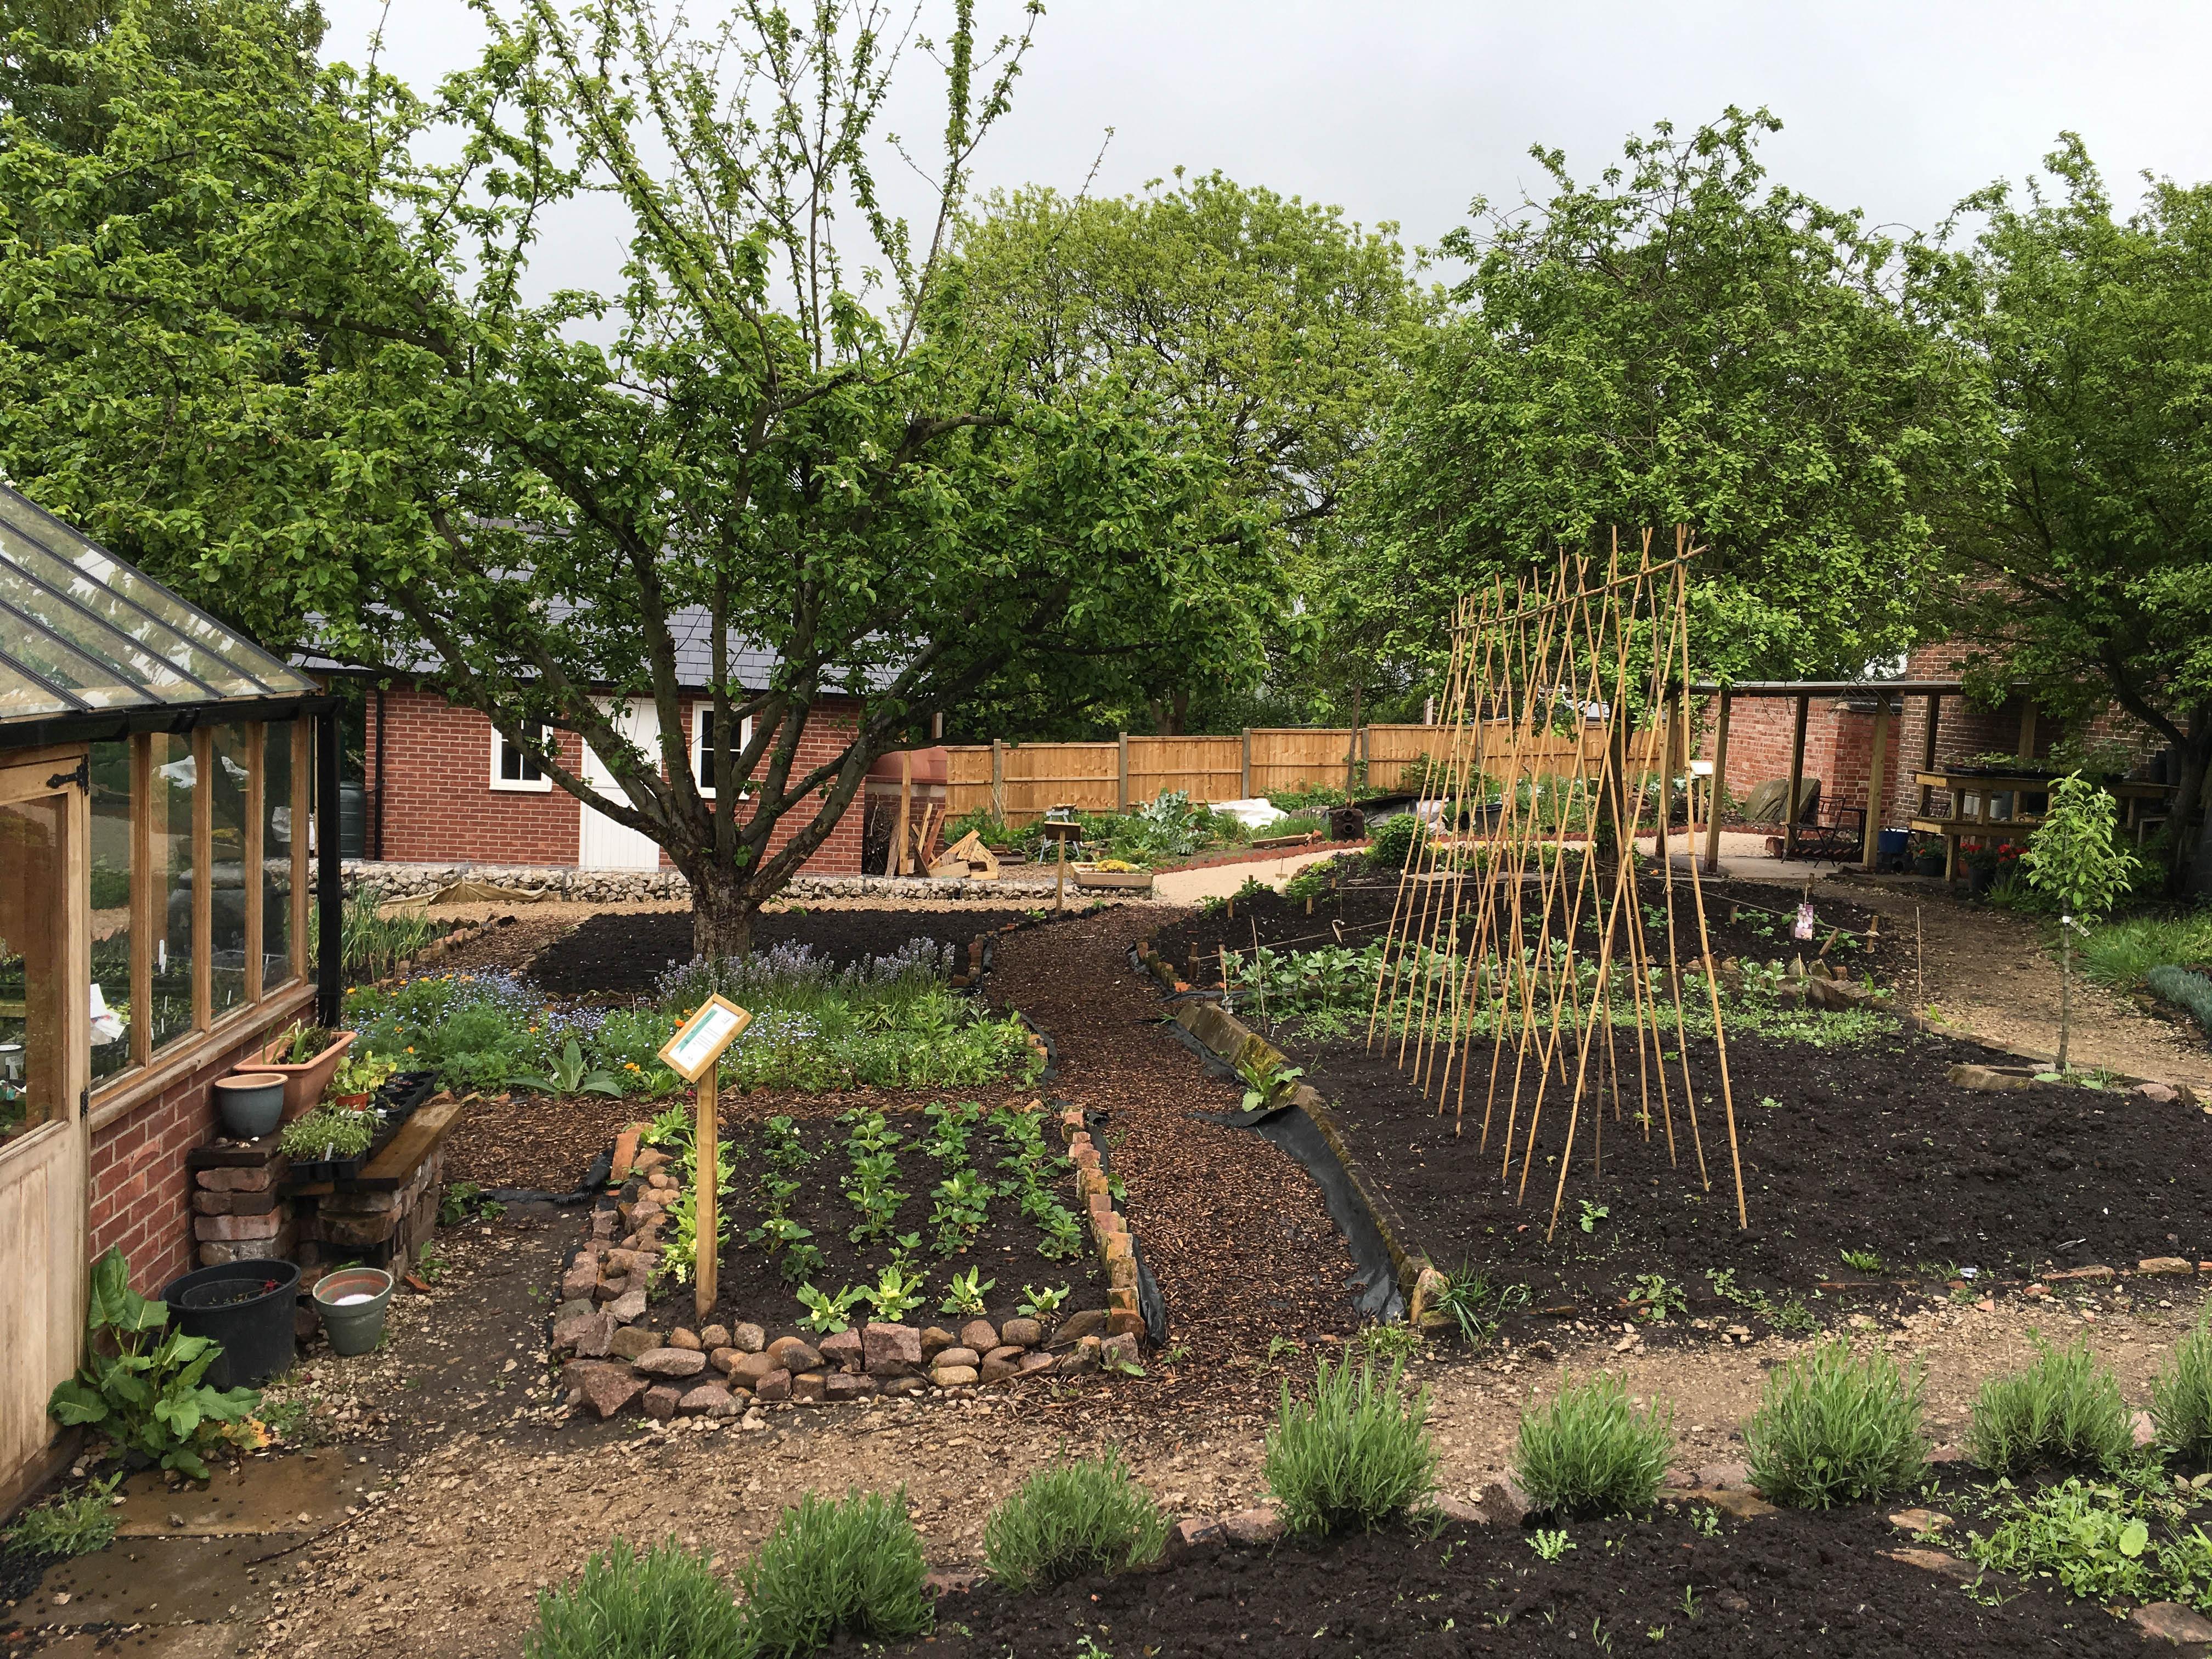 Green's Windmill Community Garden